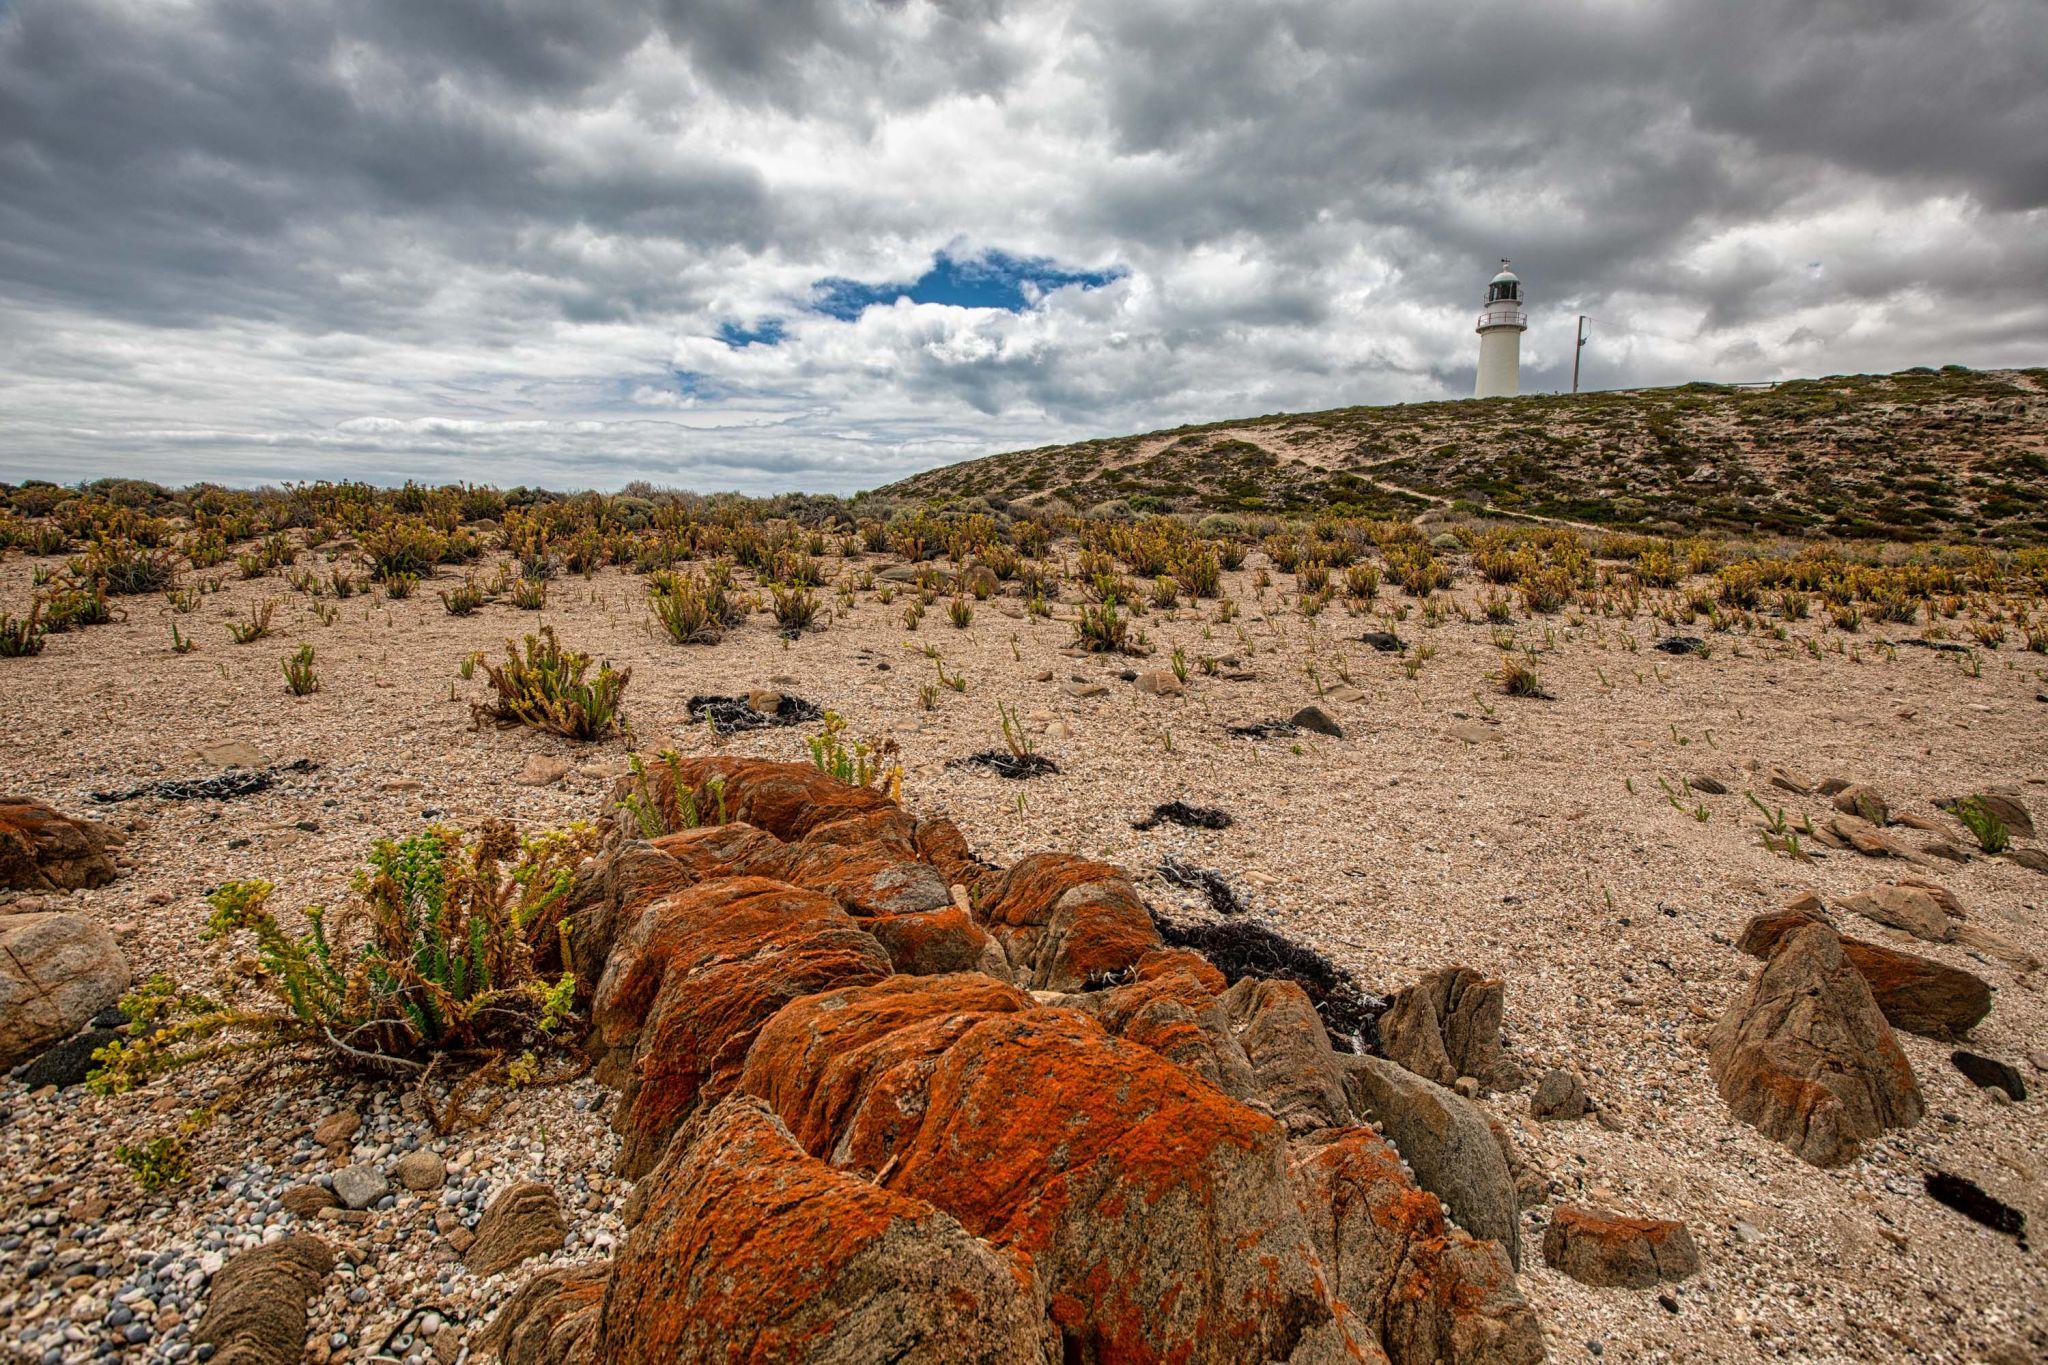 Corny Point Lighthouse sand, Yorke Peninsula, S A, Australia